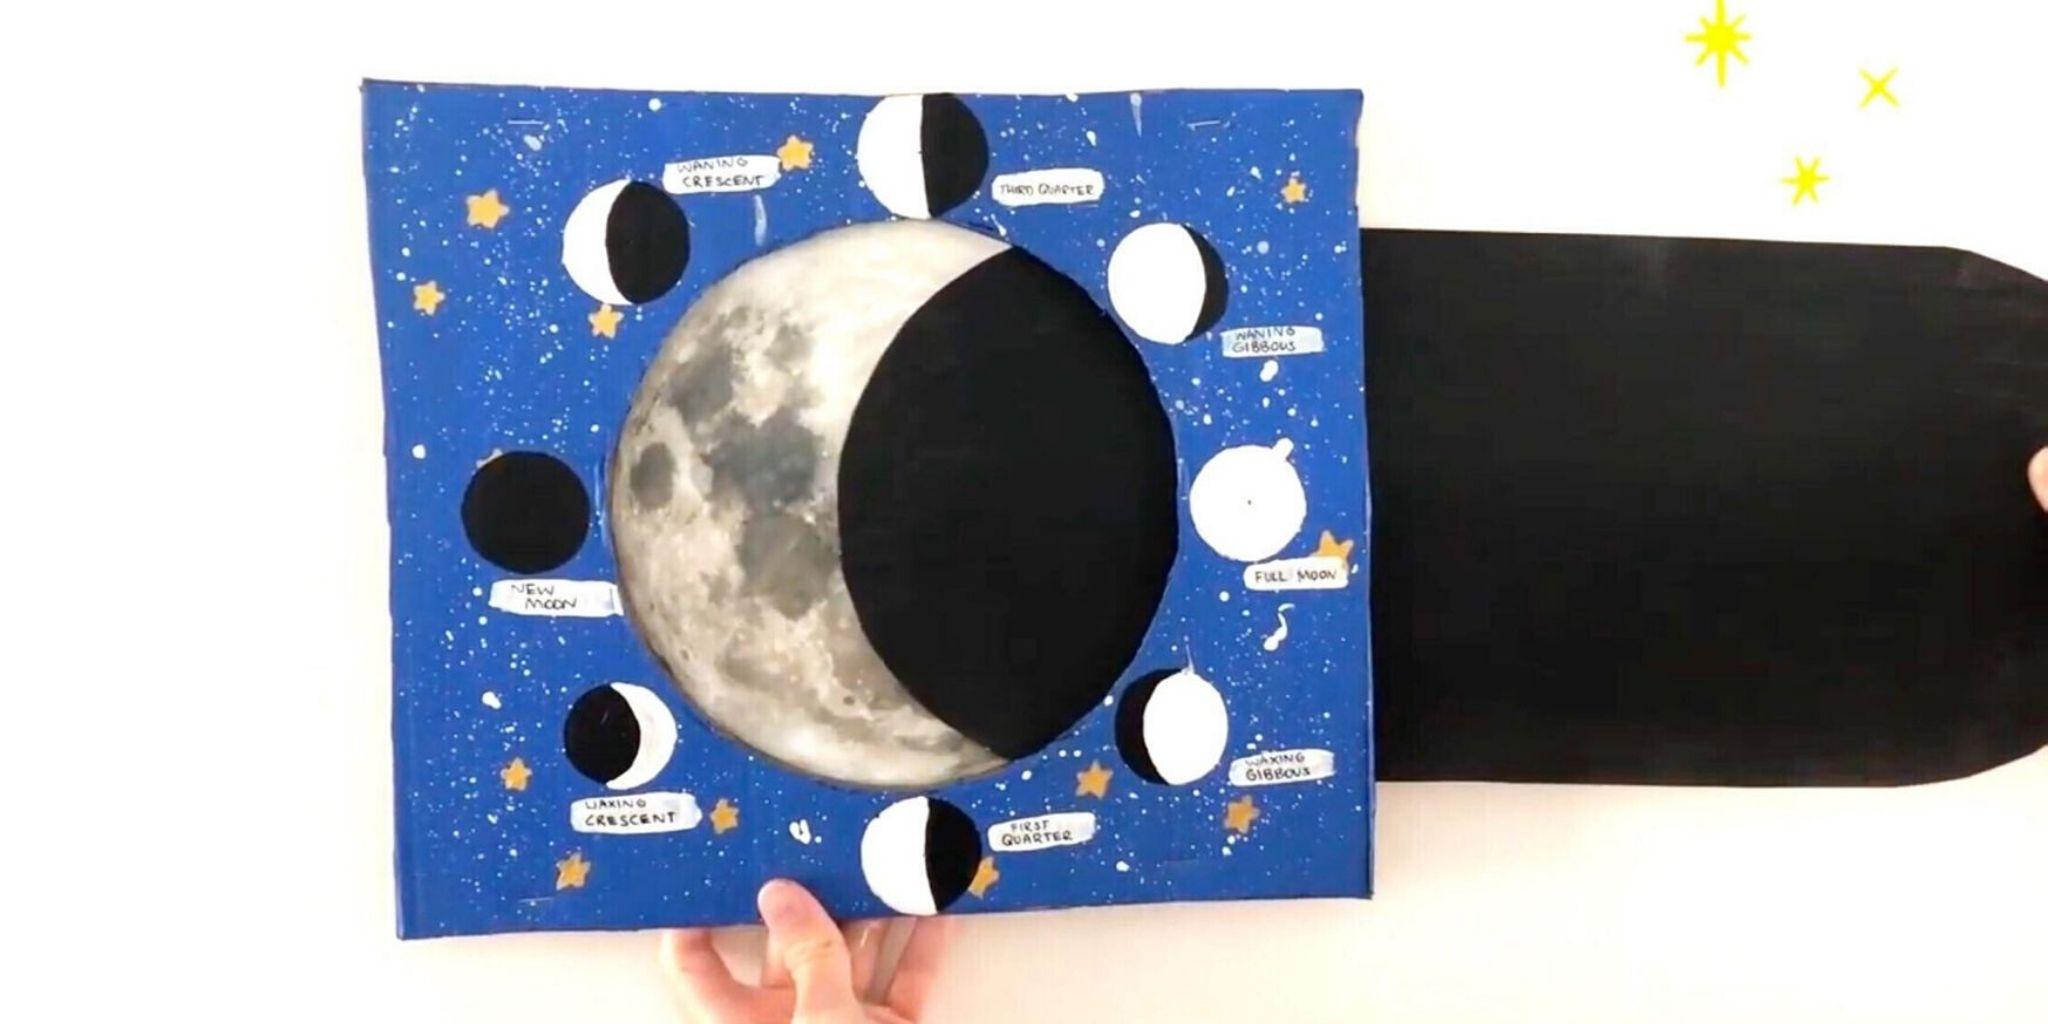 De 8 månefasene | Astronomi for barn